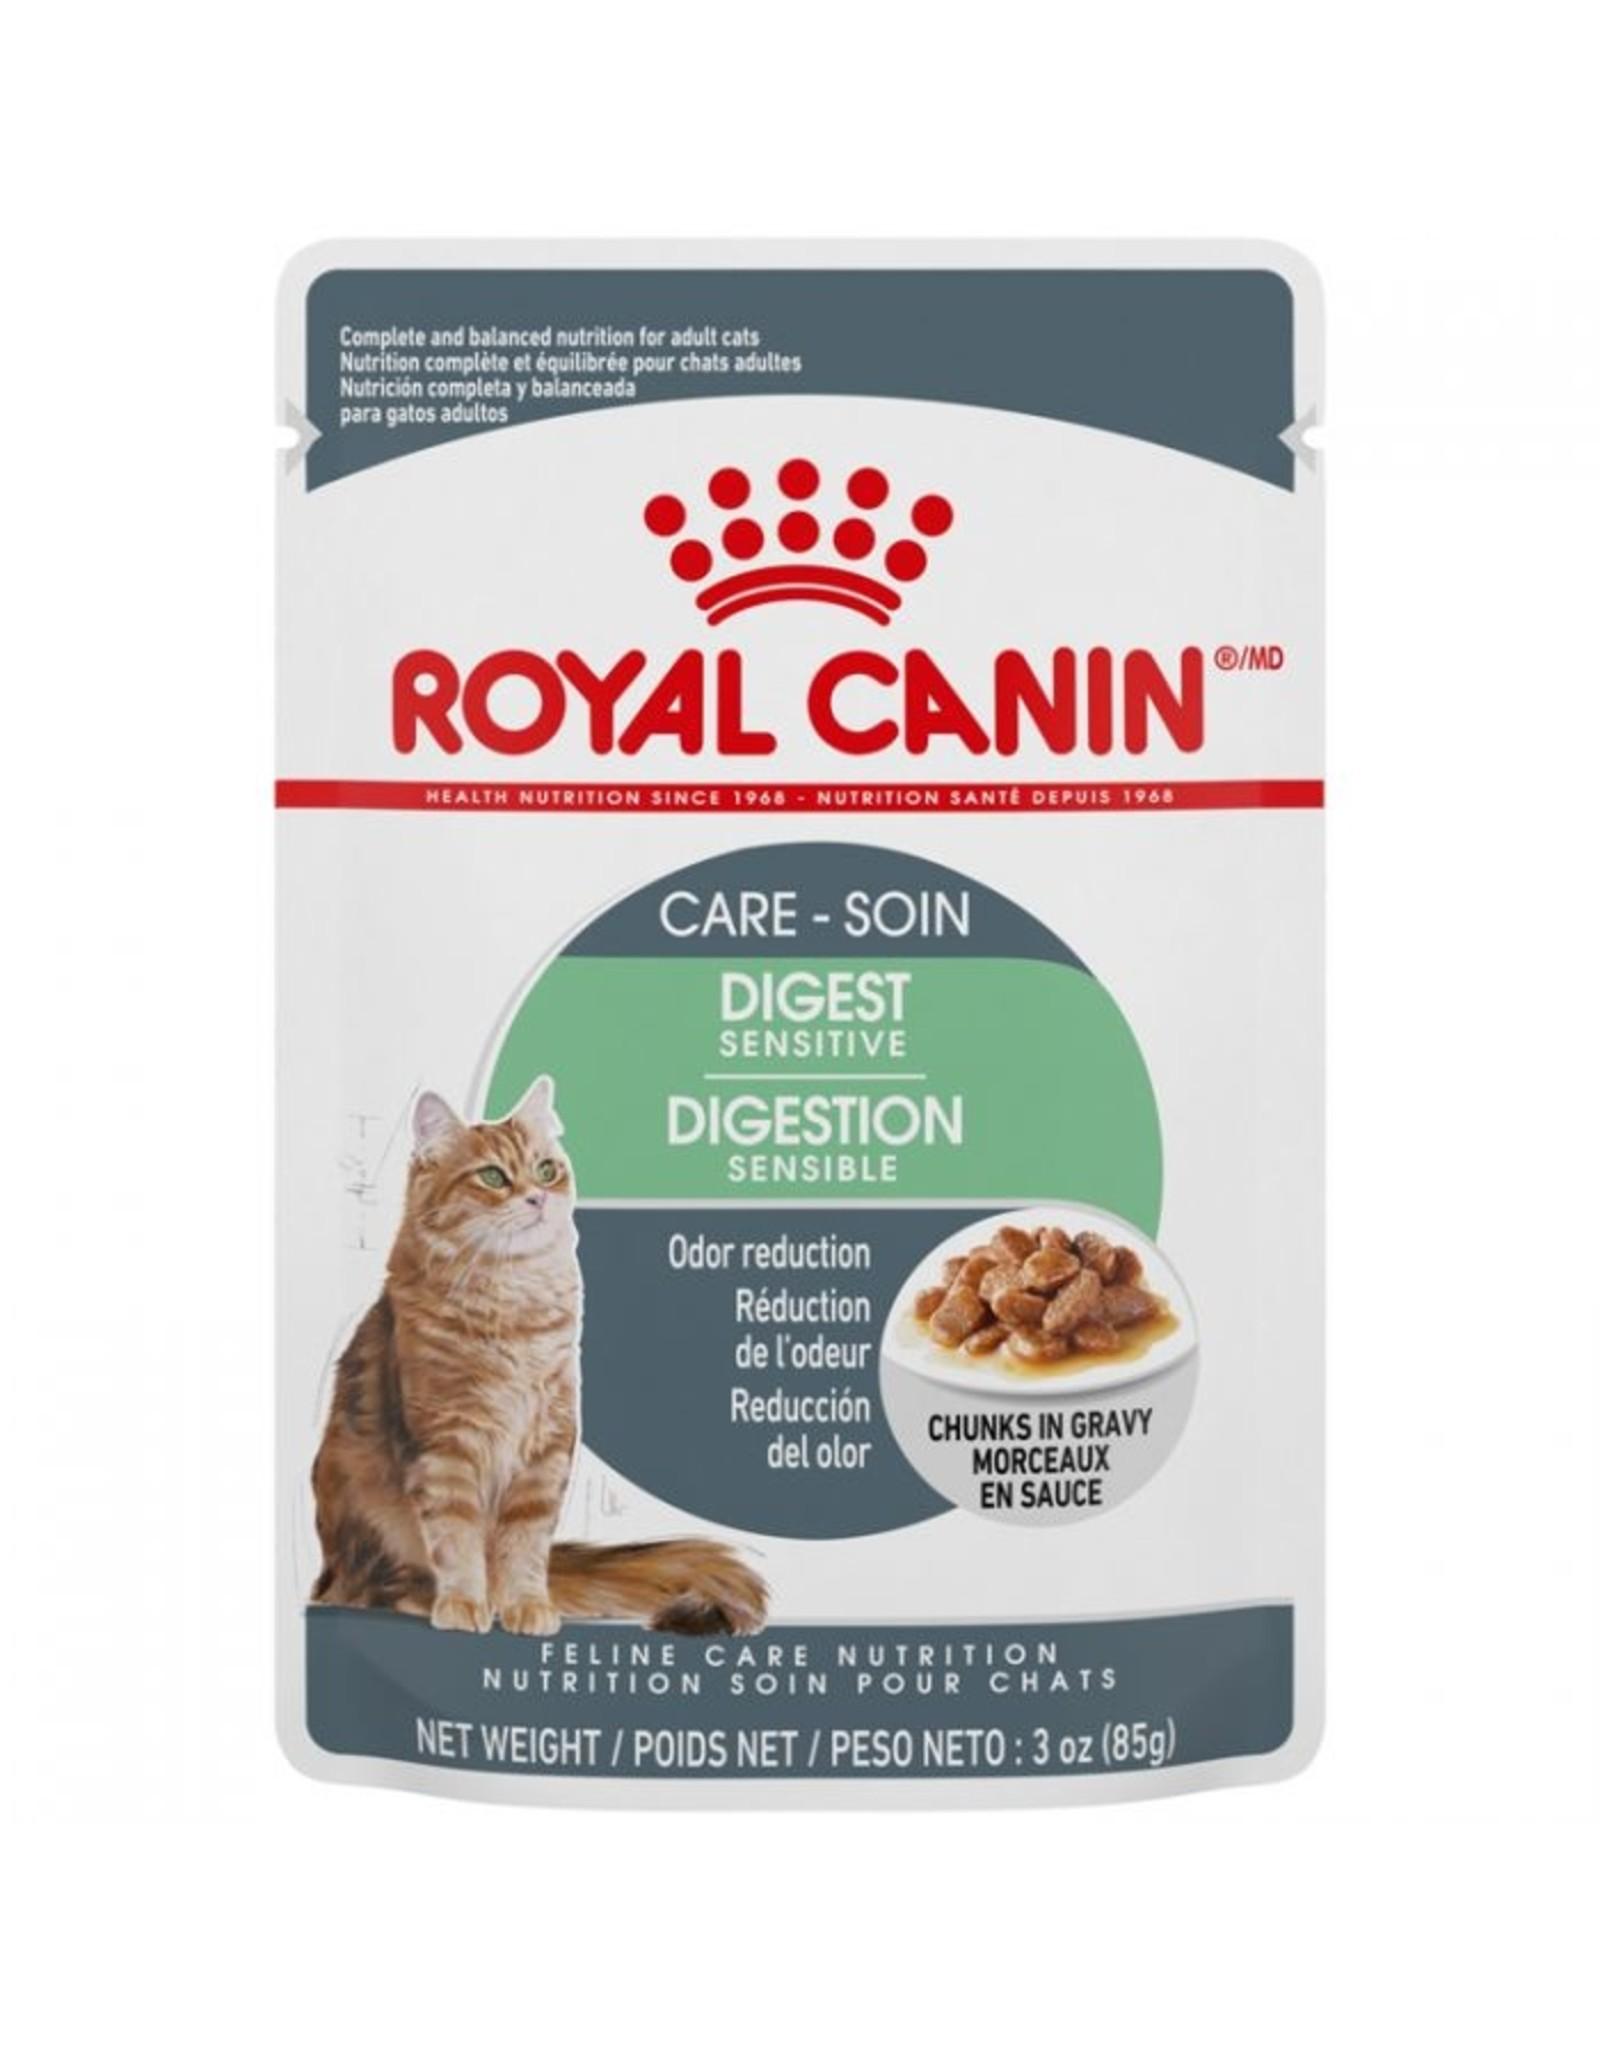 Royal Canin Royal Canin Digest Sensitive Chunks 85g